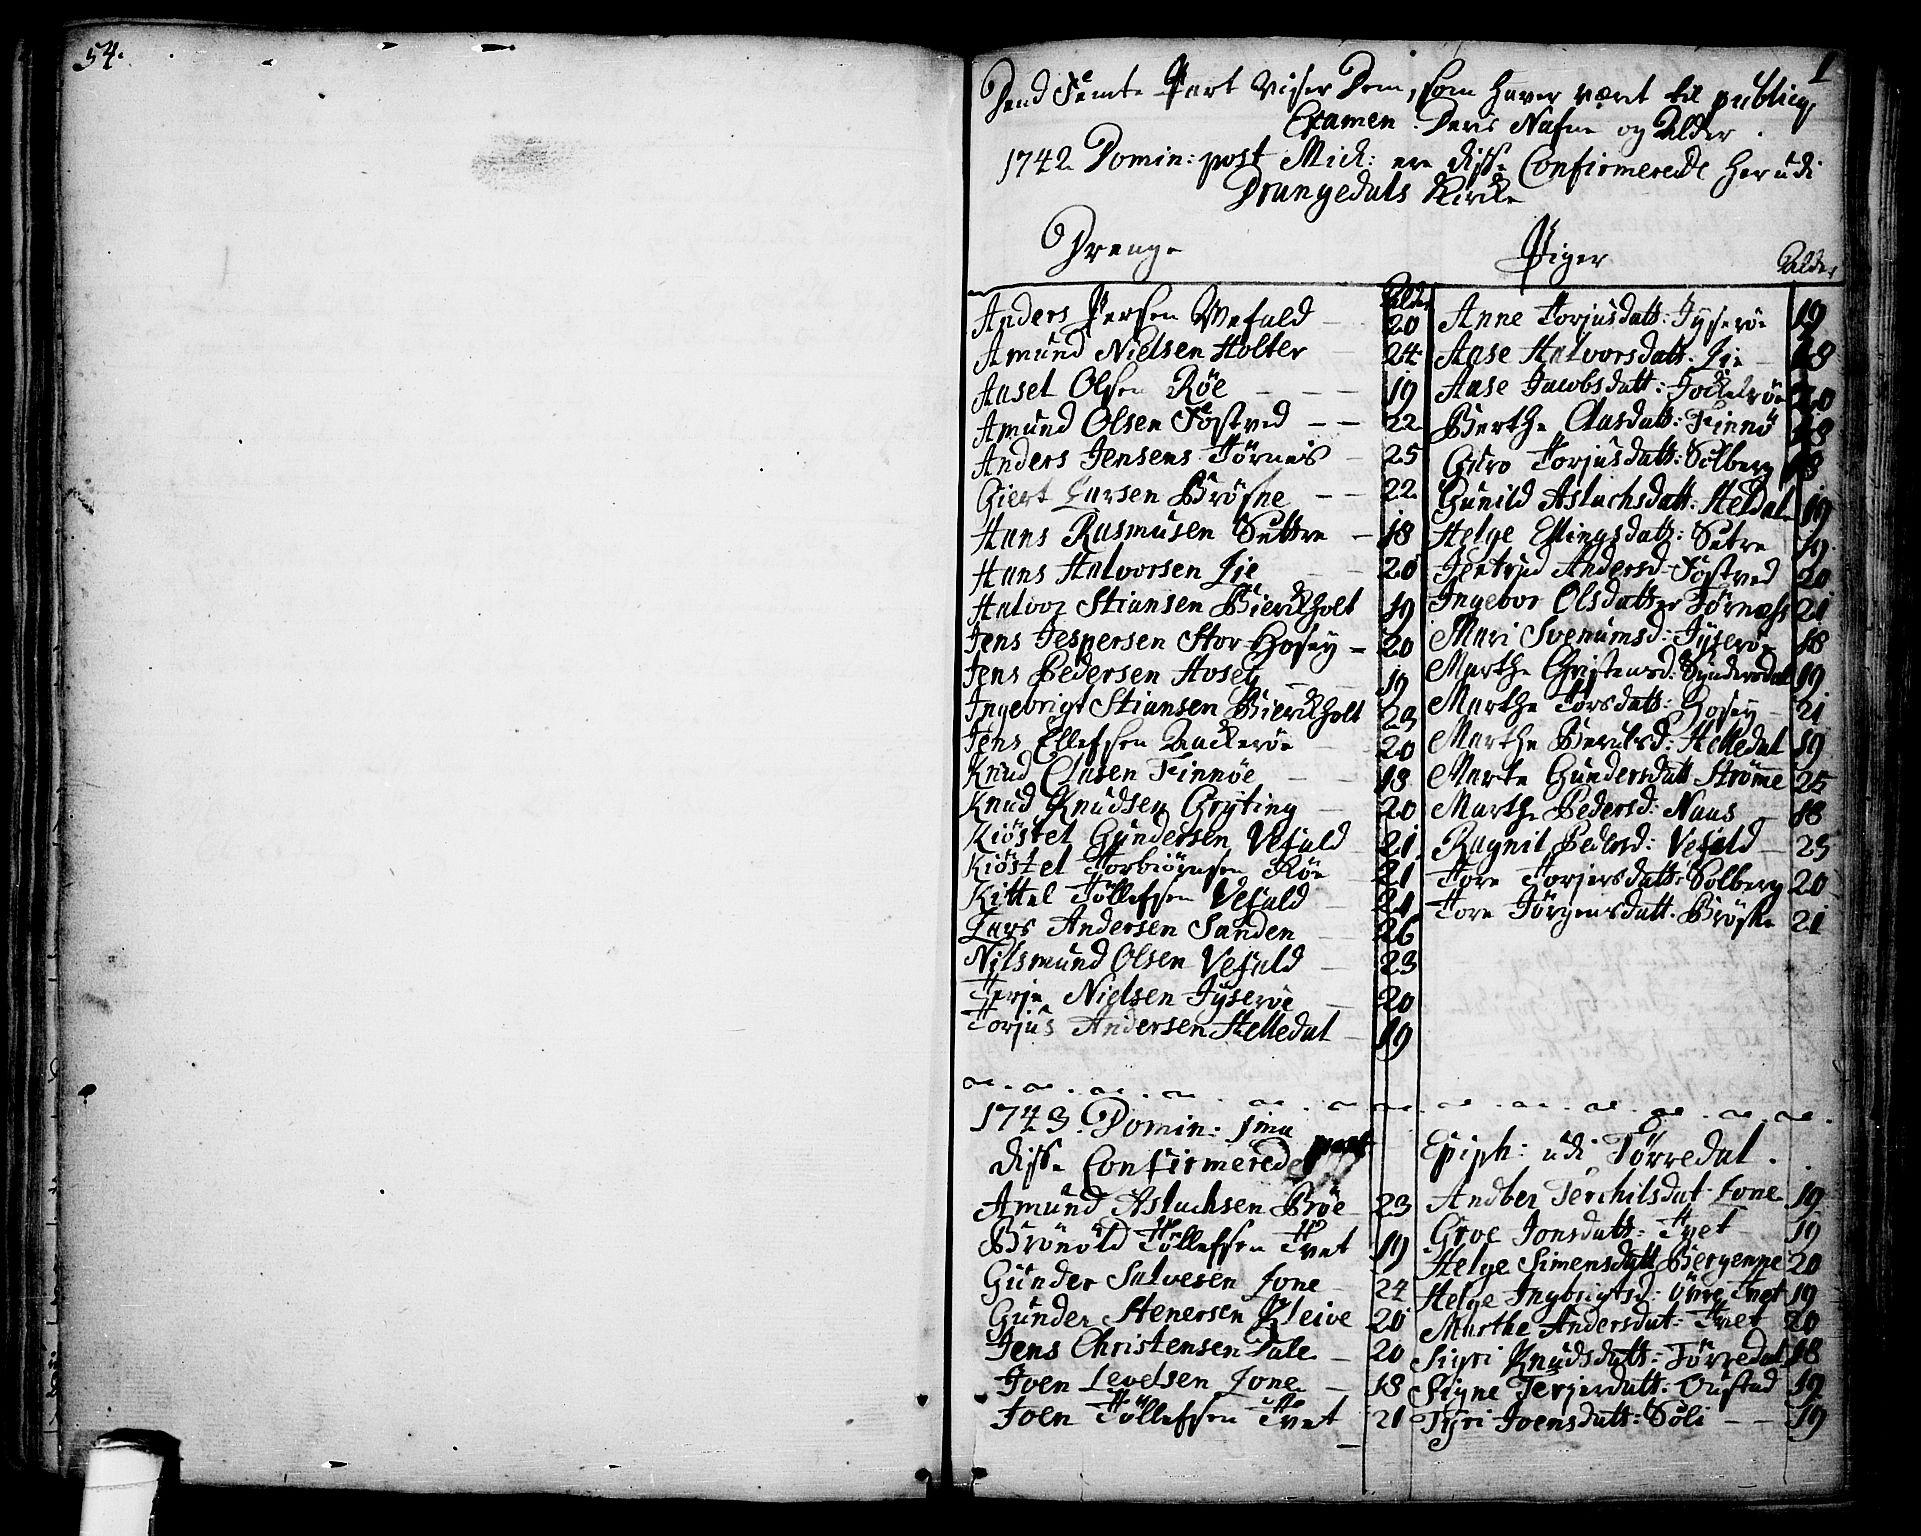 SAKO, Drangedal kirkebøker, F/Fa/L0001: Ministerialbok nr. 1, 1697-1767, s. 0-1